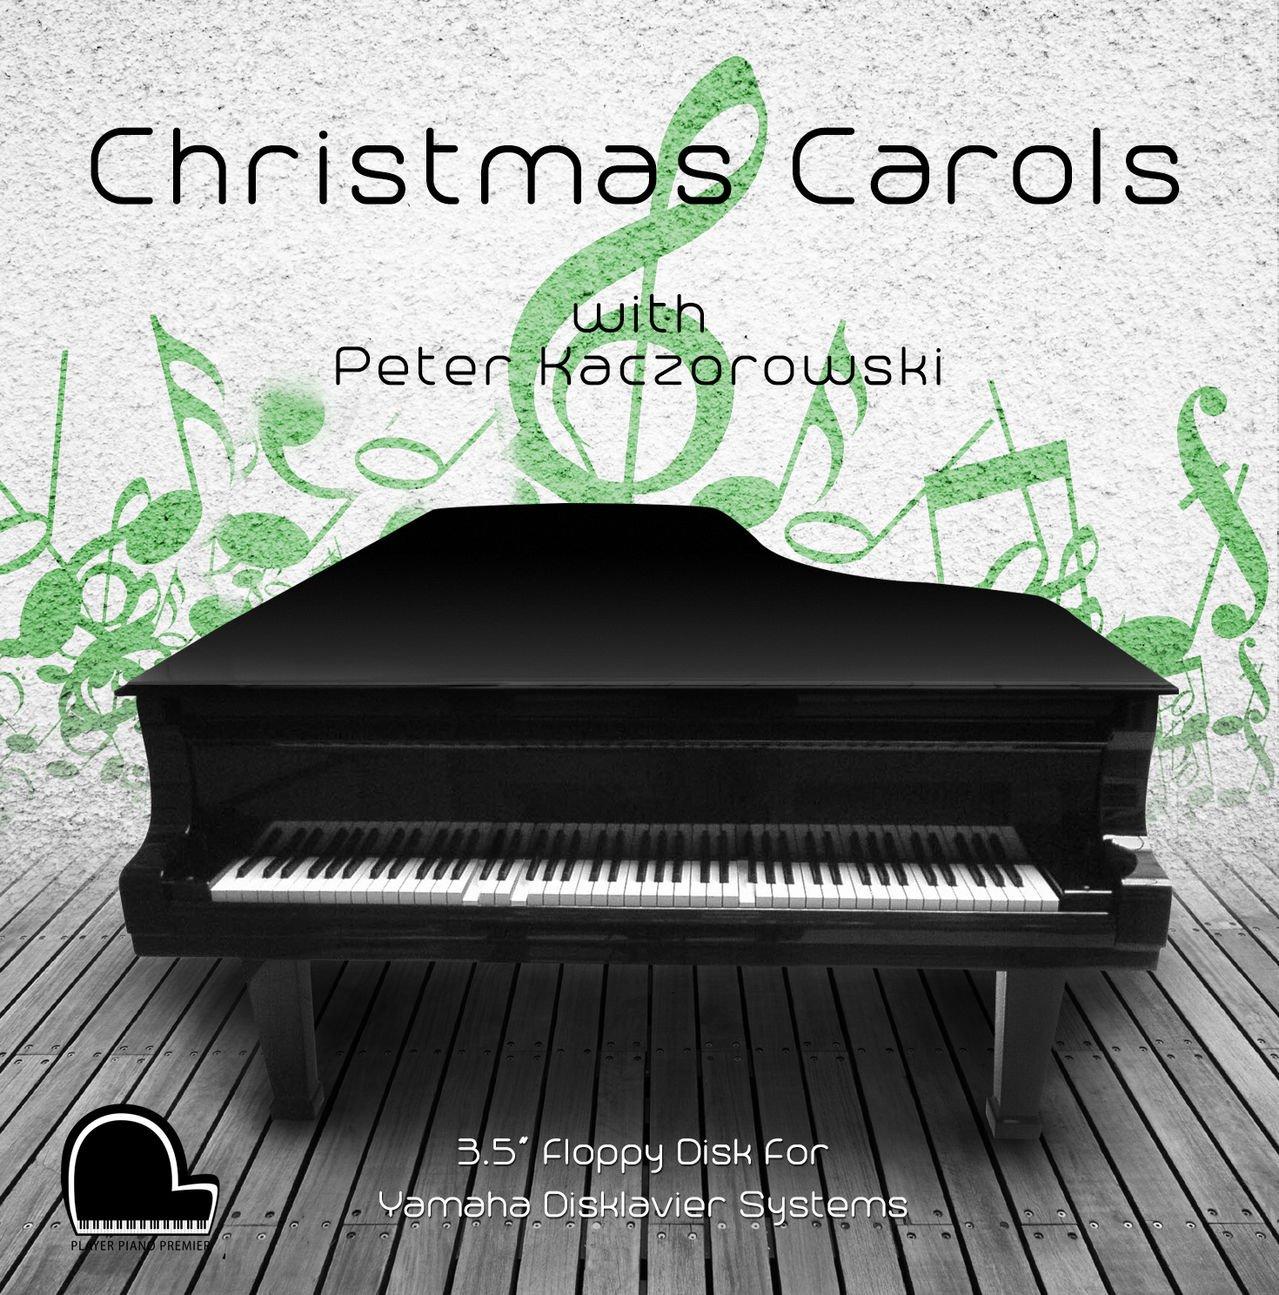 Christmas Carols - Yamaha Disklavier Compatible Player Piano Music on 3.5'' DD 720k Floppy Disk